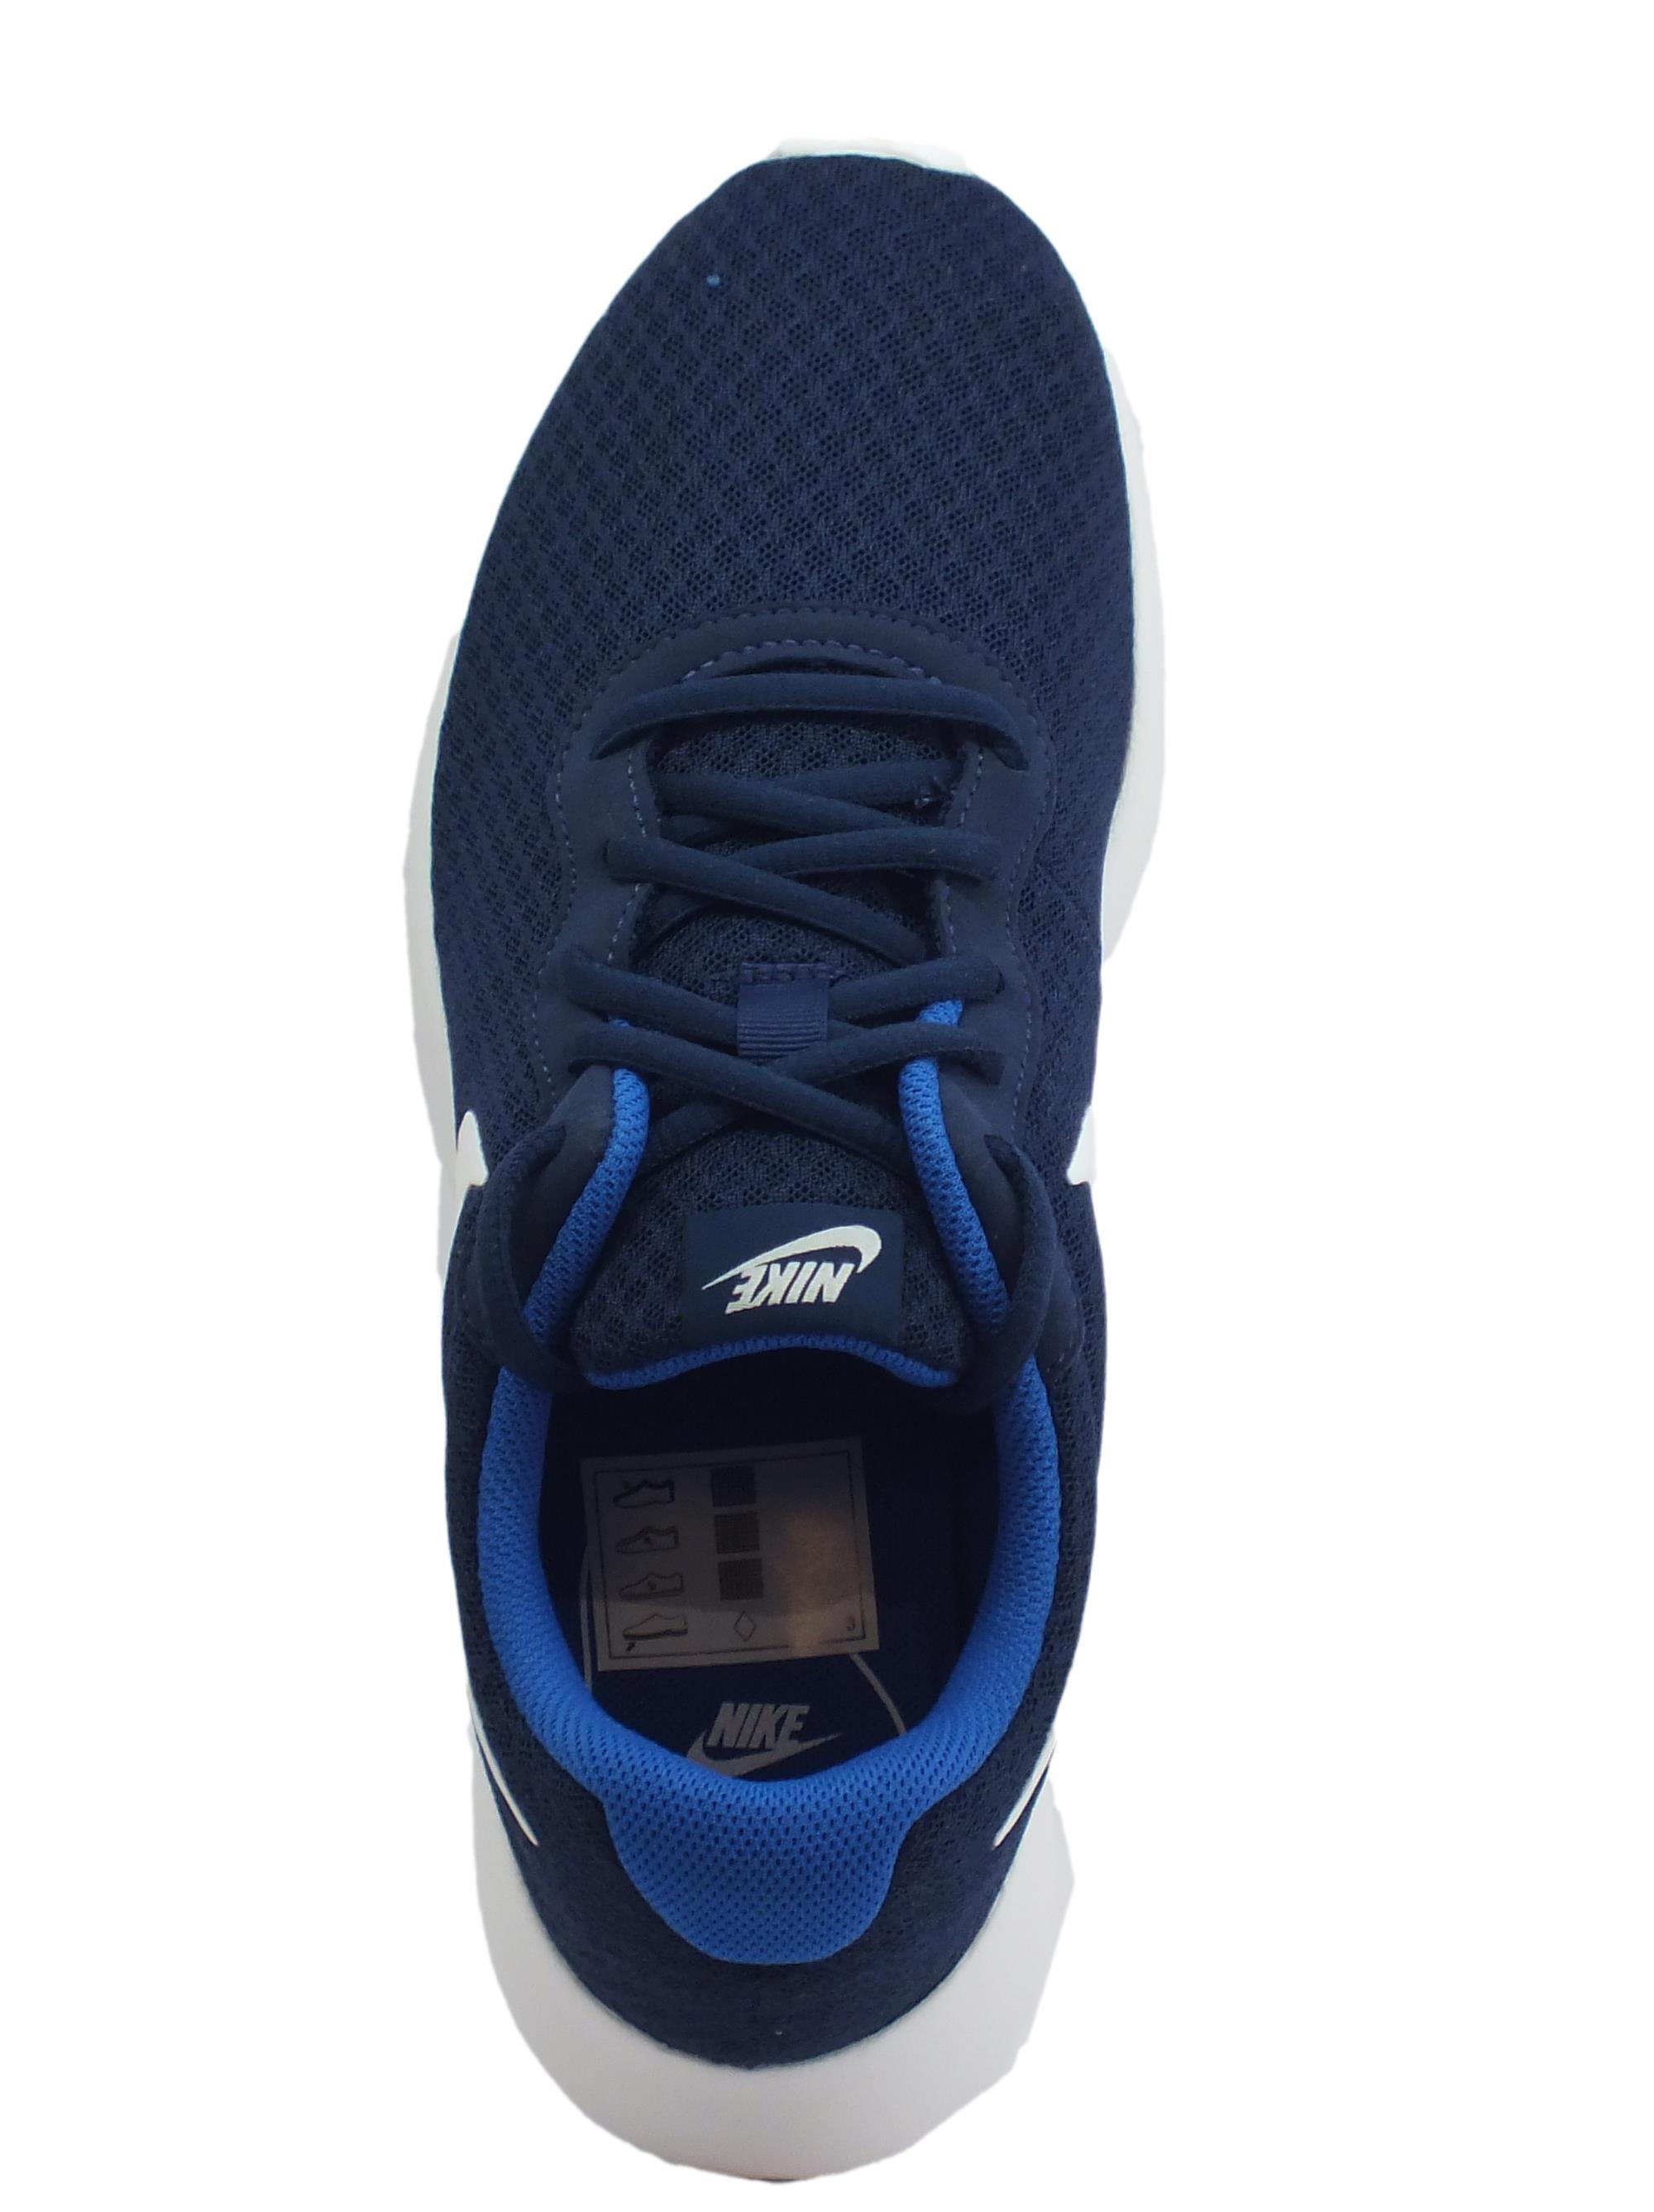 Scarpe sportive Nike Tanjun uomo tessuto blu scuro - Vitiello Calzature a5ee792296e